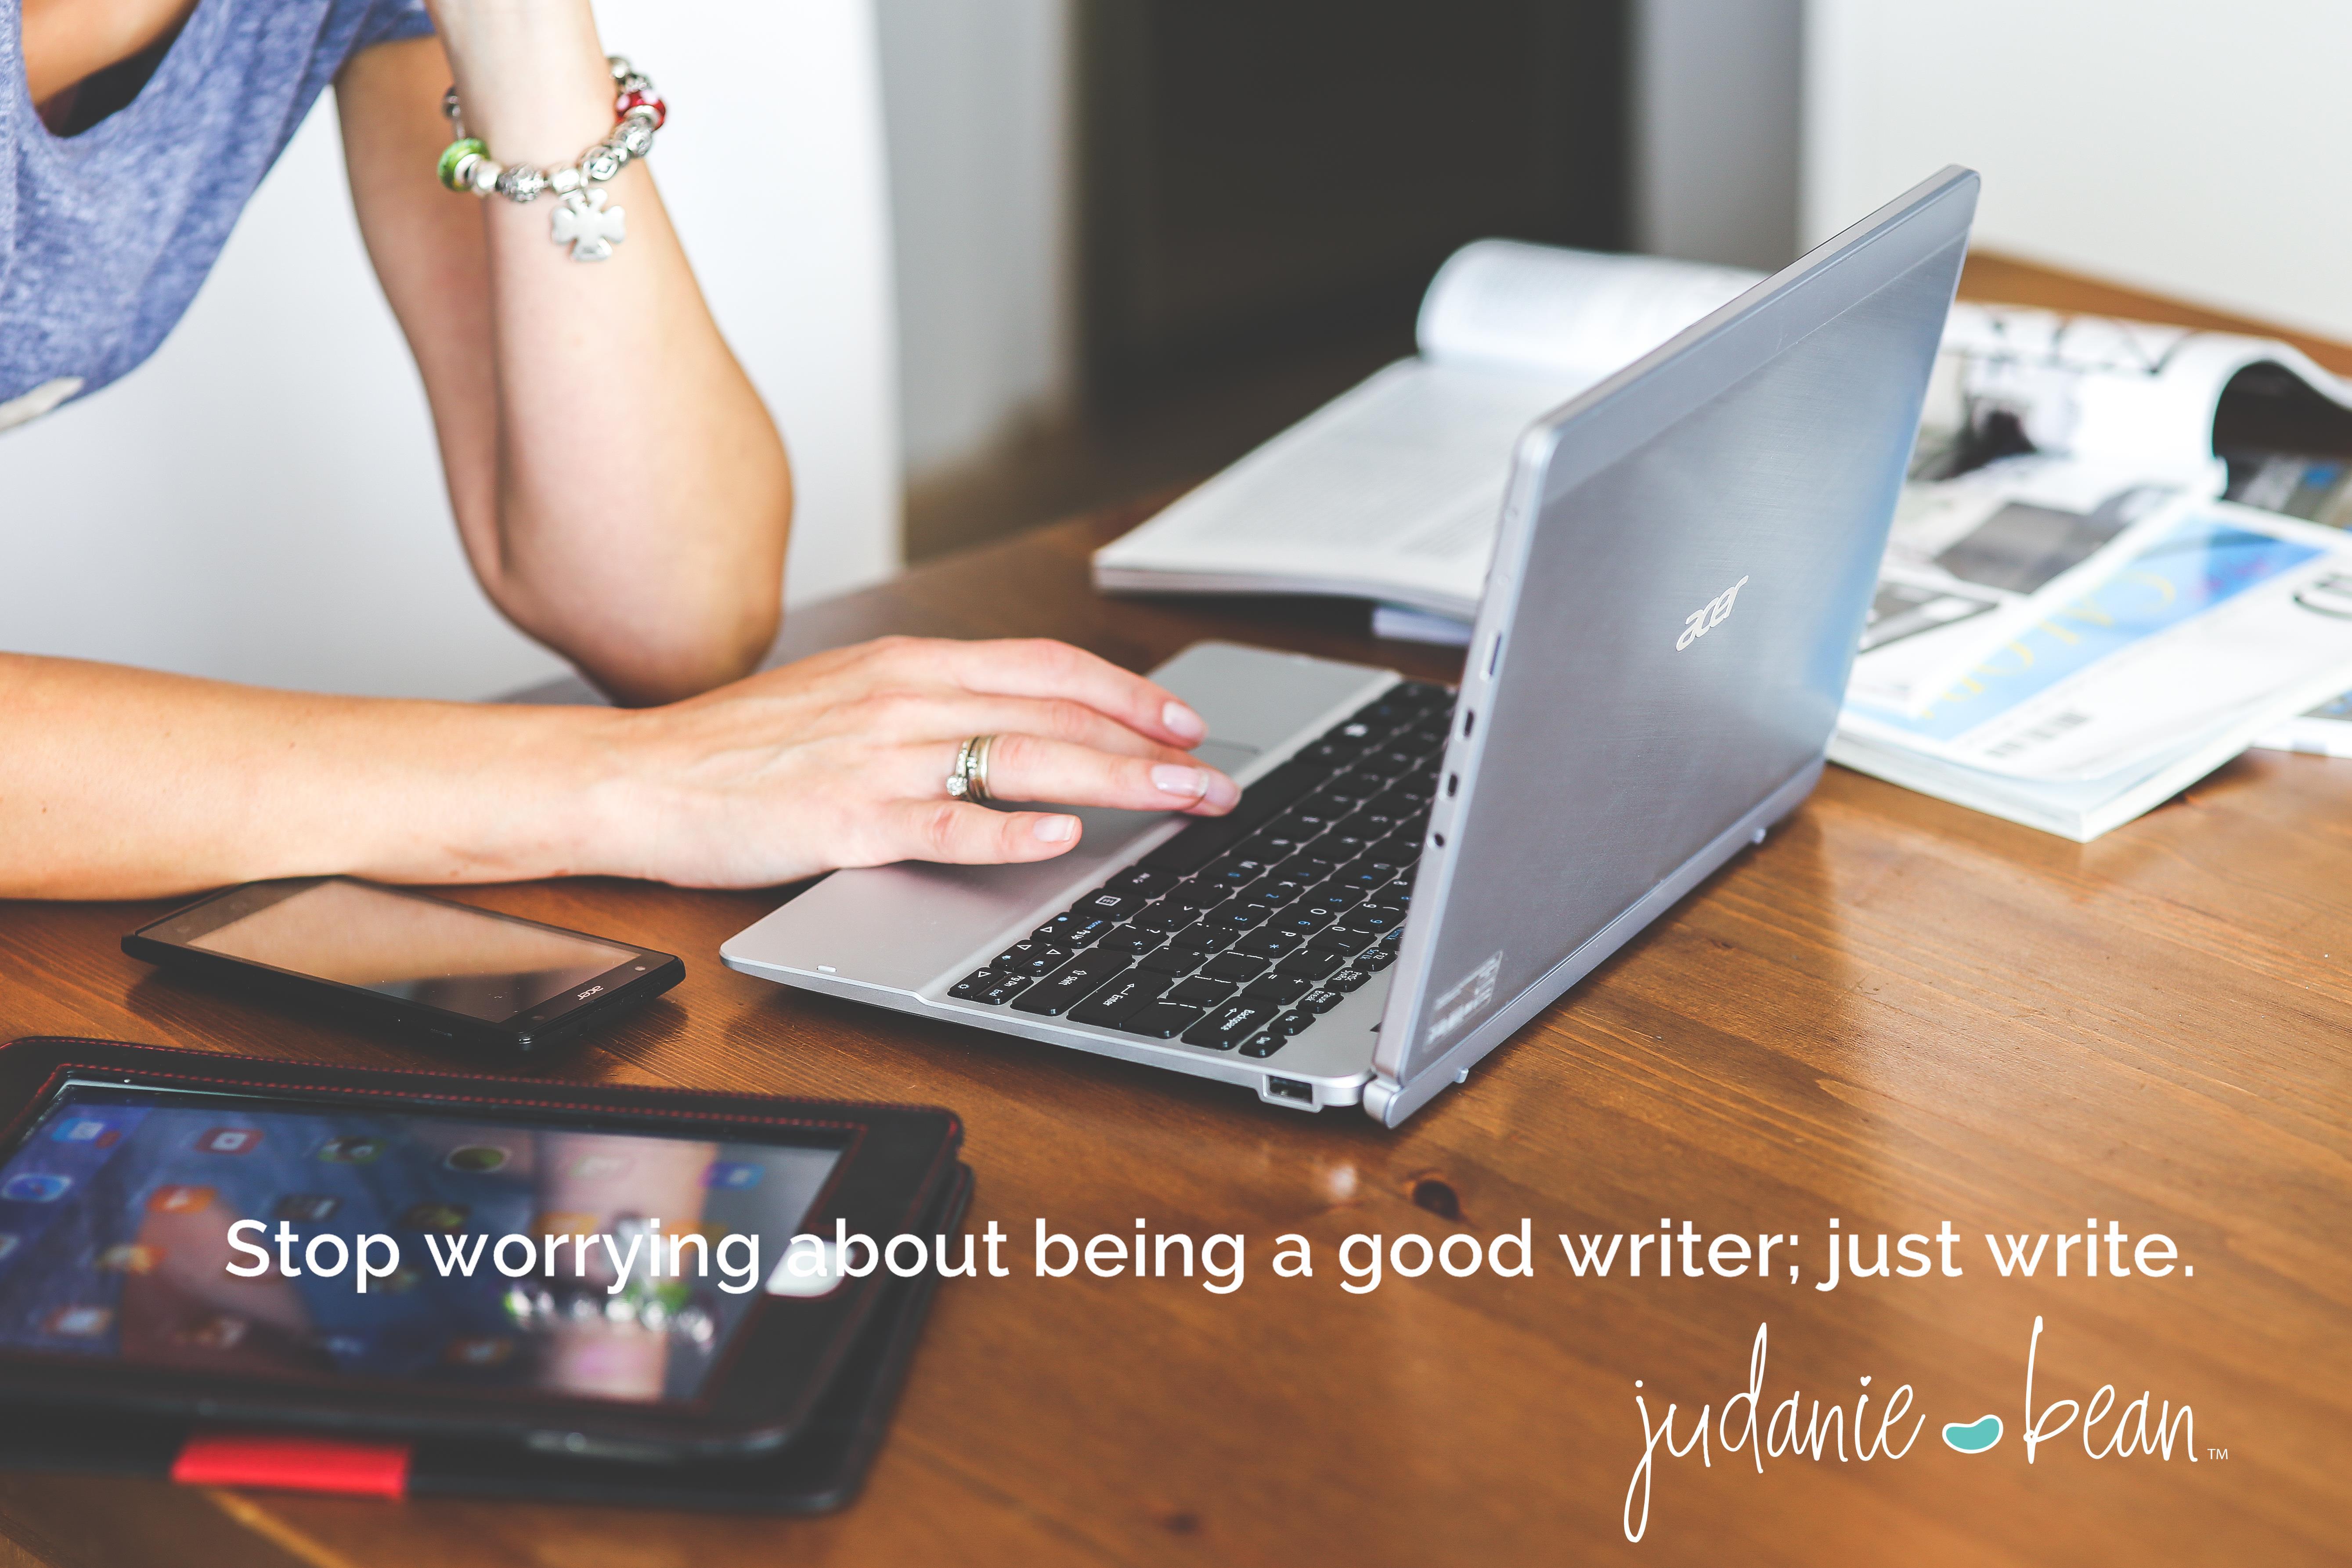 writingadvice